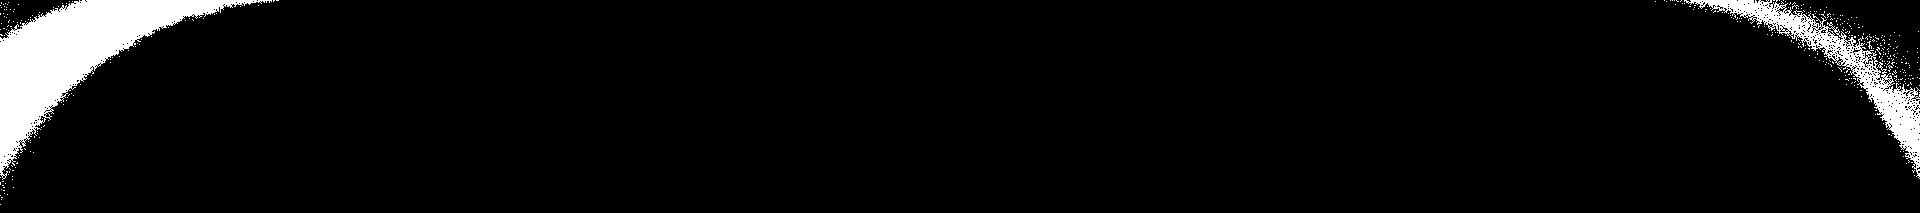 sombra canjea